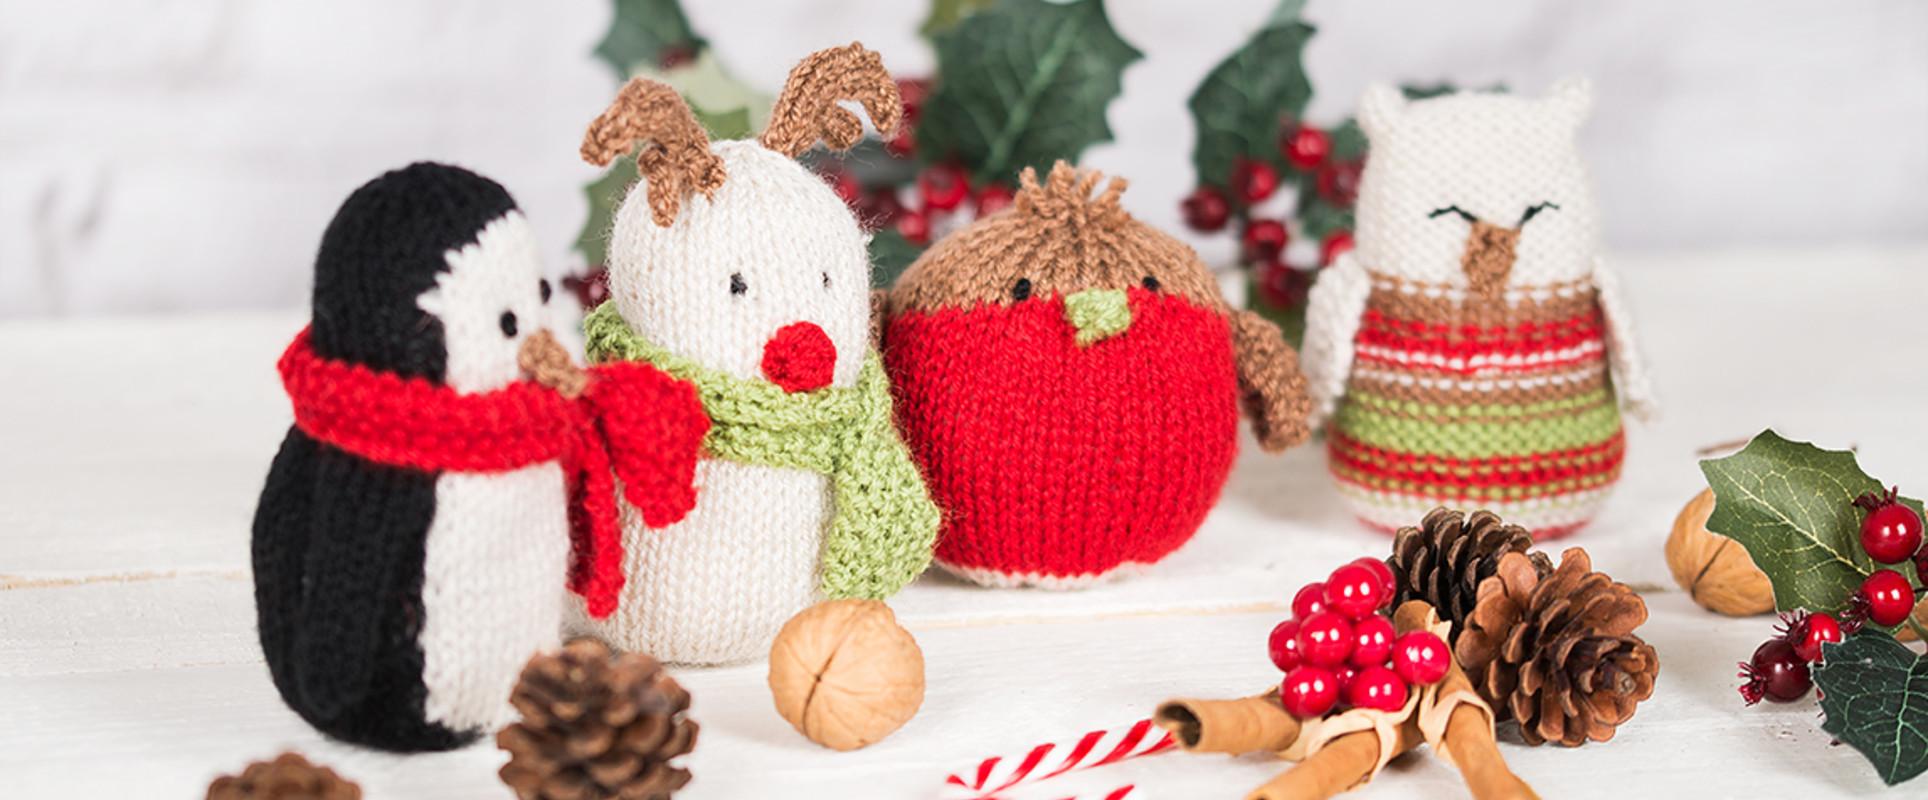 10 Free Patterns To Get You Knitting This Christmas Loveknitting